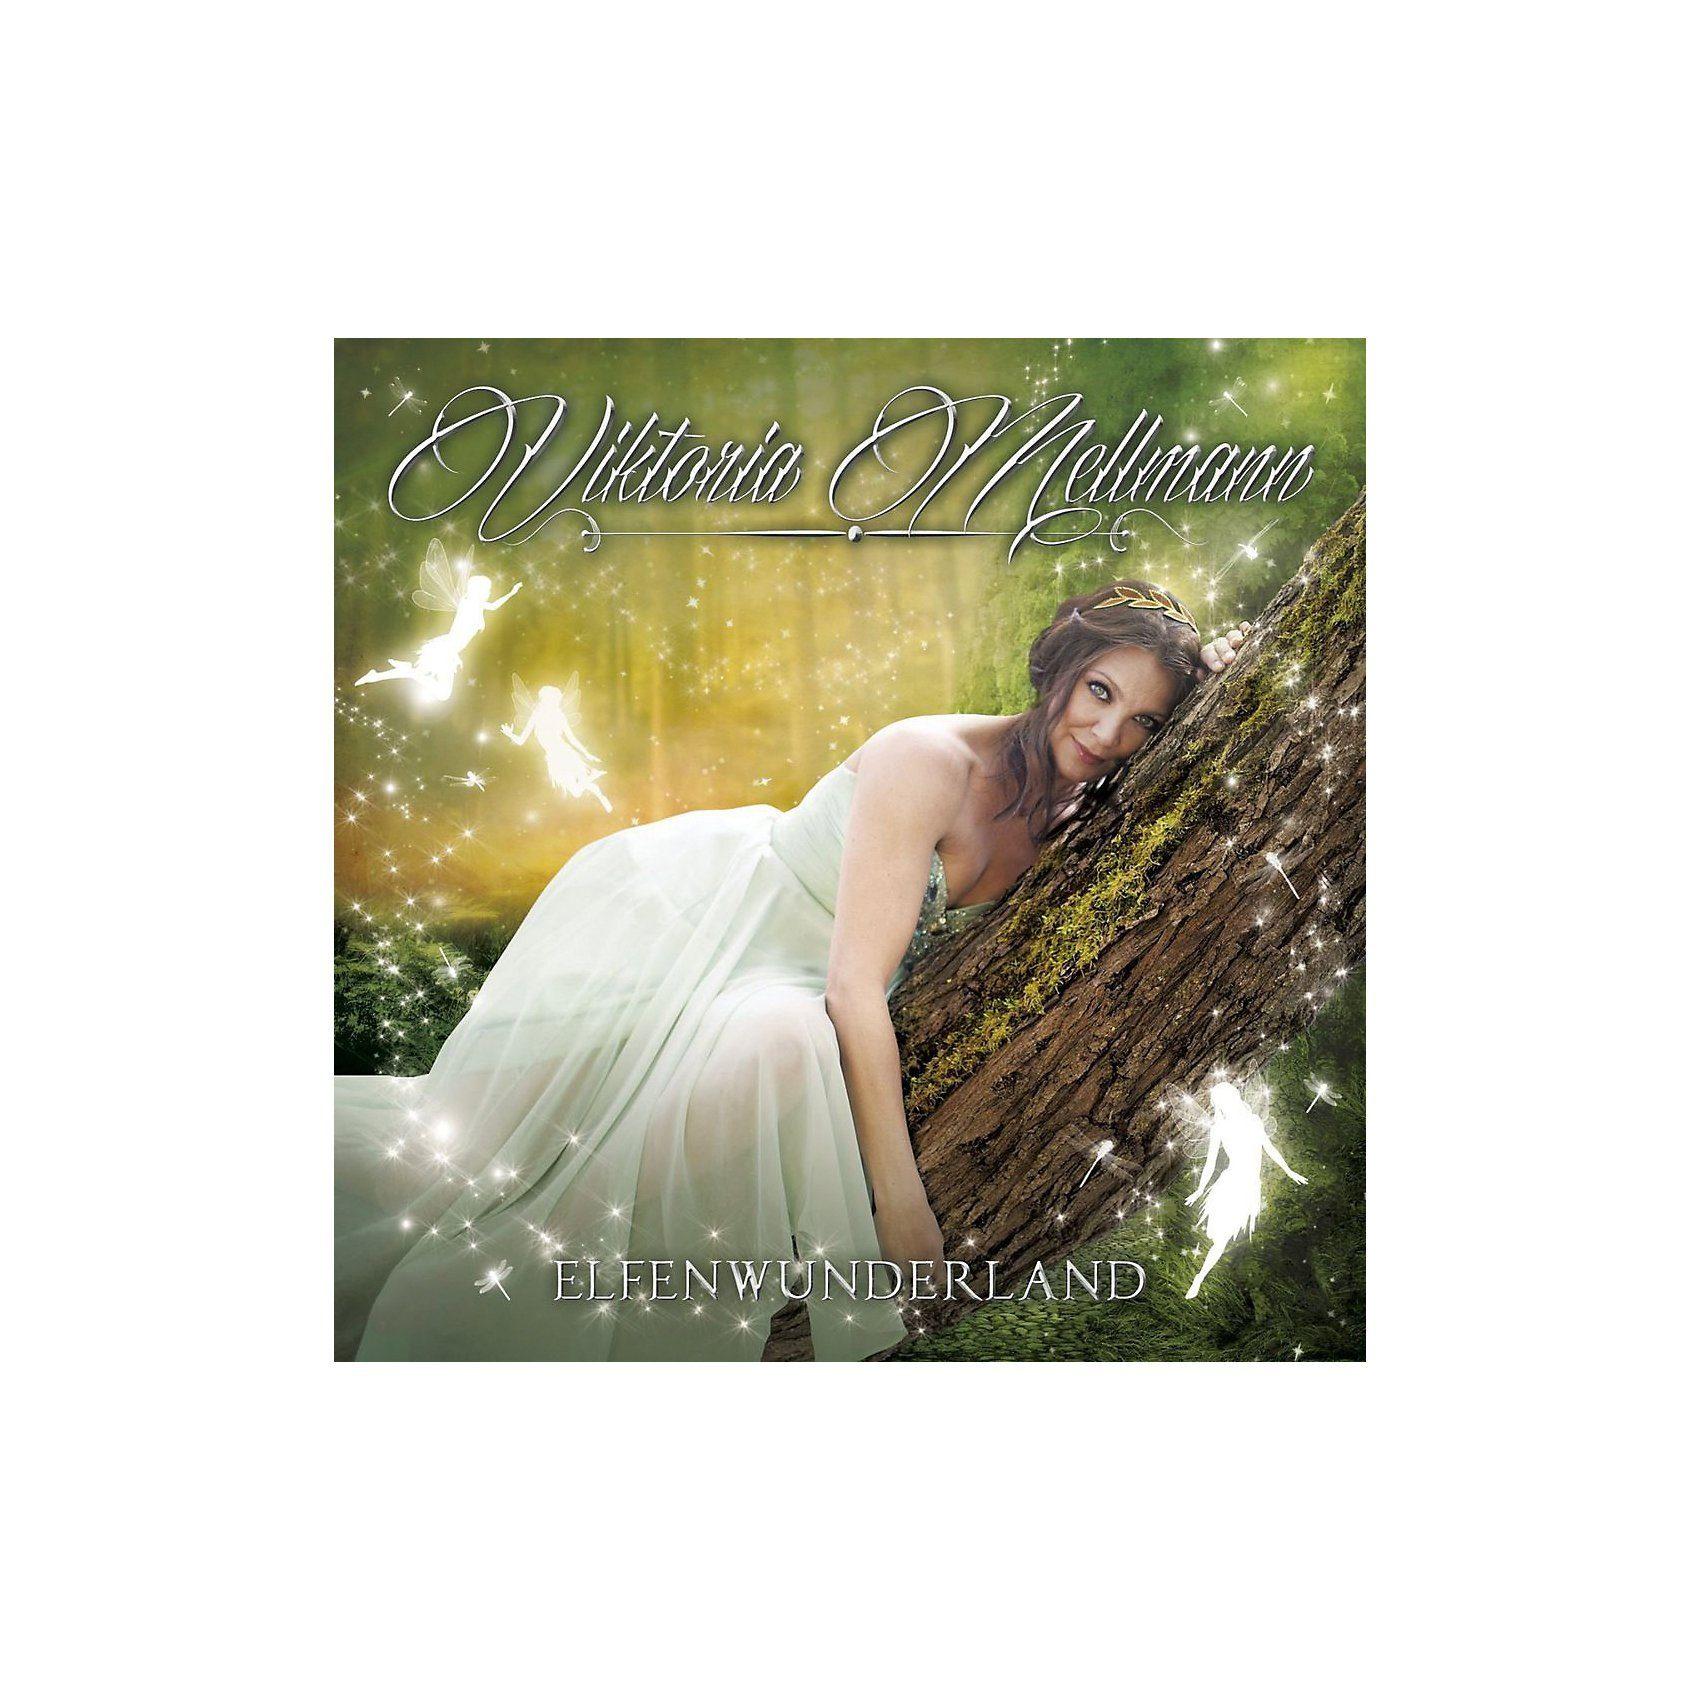 Universal CD Elfenwunderland -Viktoria Mellmann